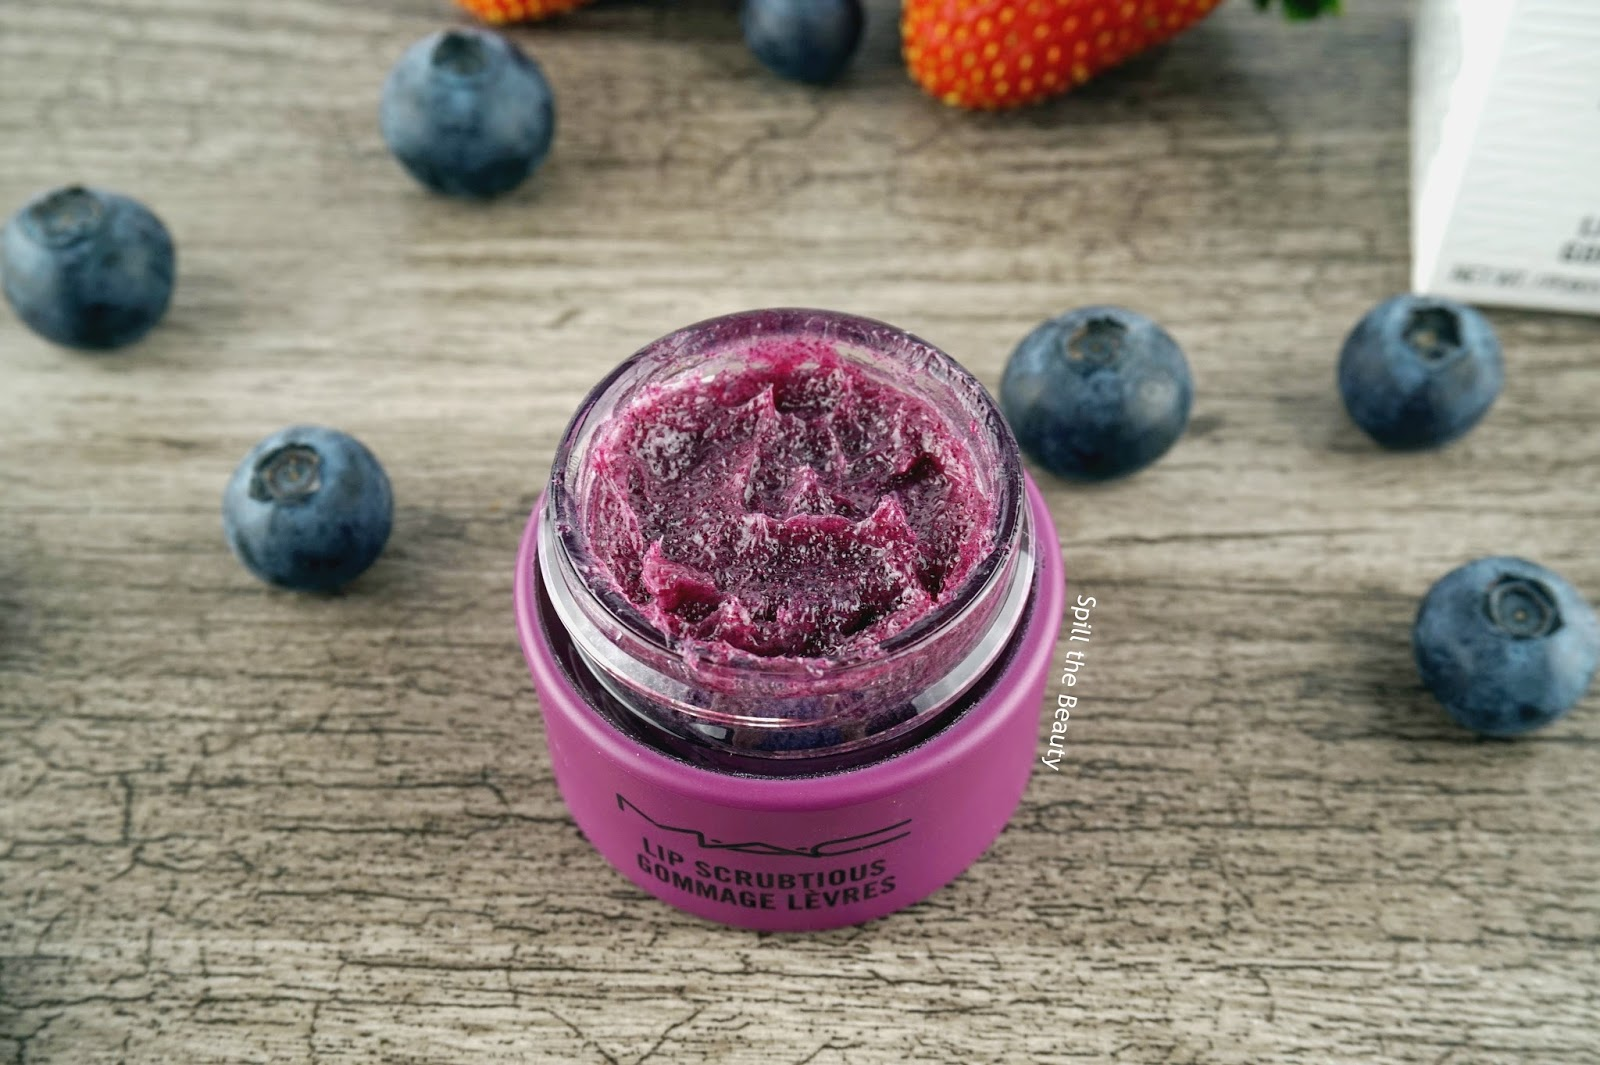 mac lip scrubtious summer berry review 3 texture